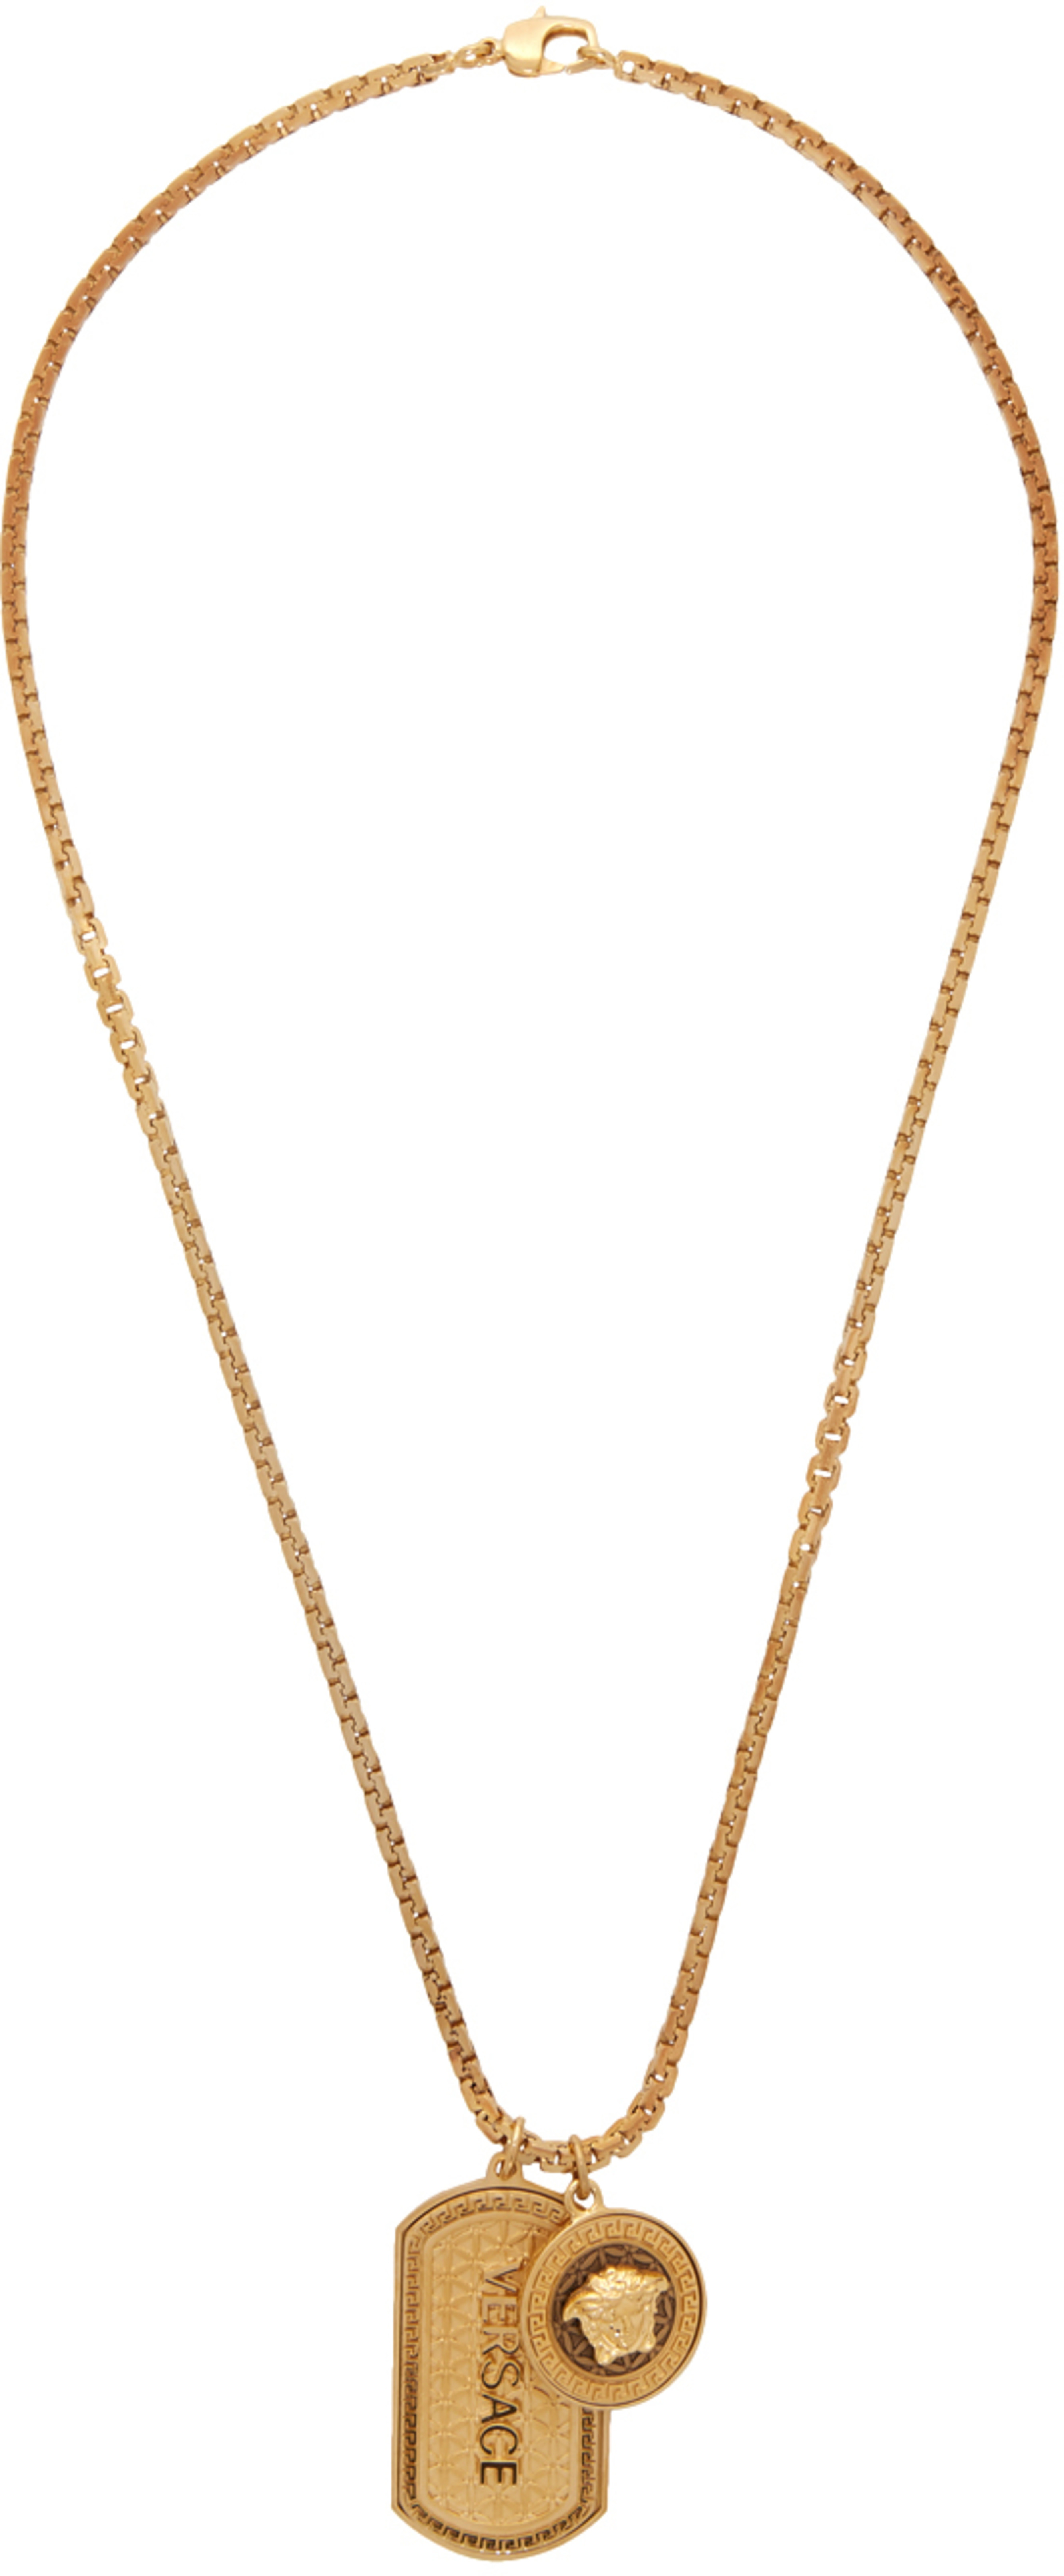 66cd1f37588905 Versace jewelry for Men | SSENSE